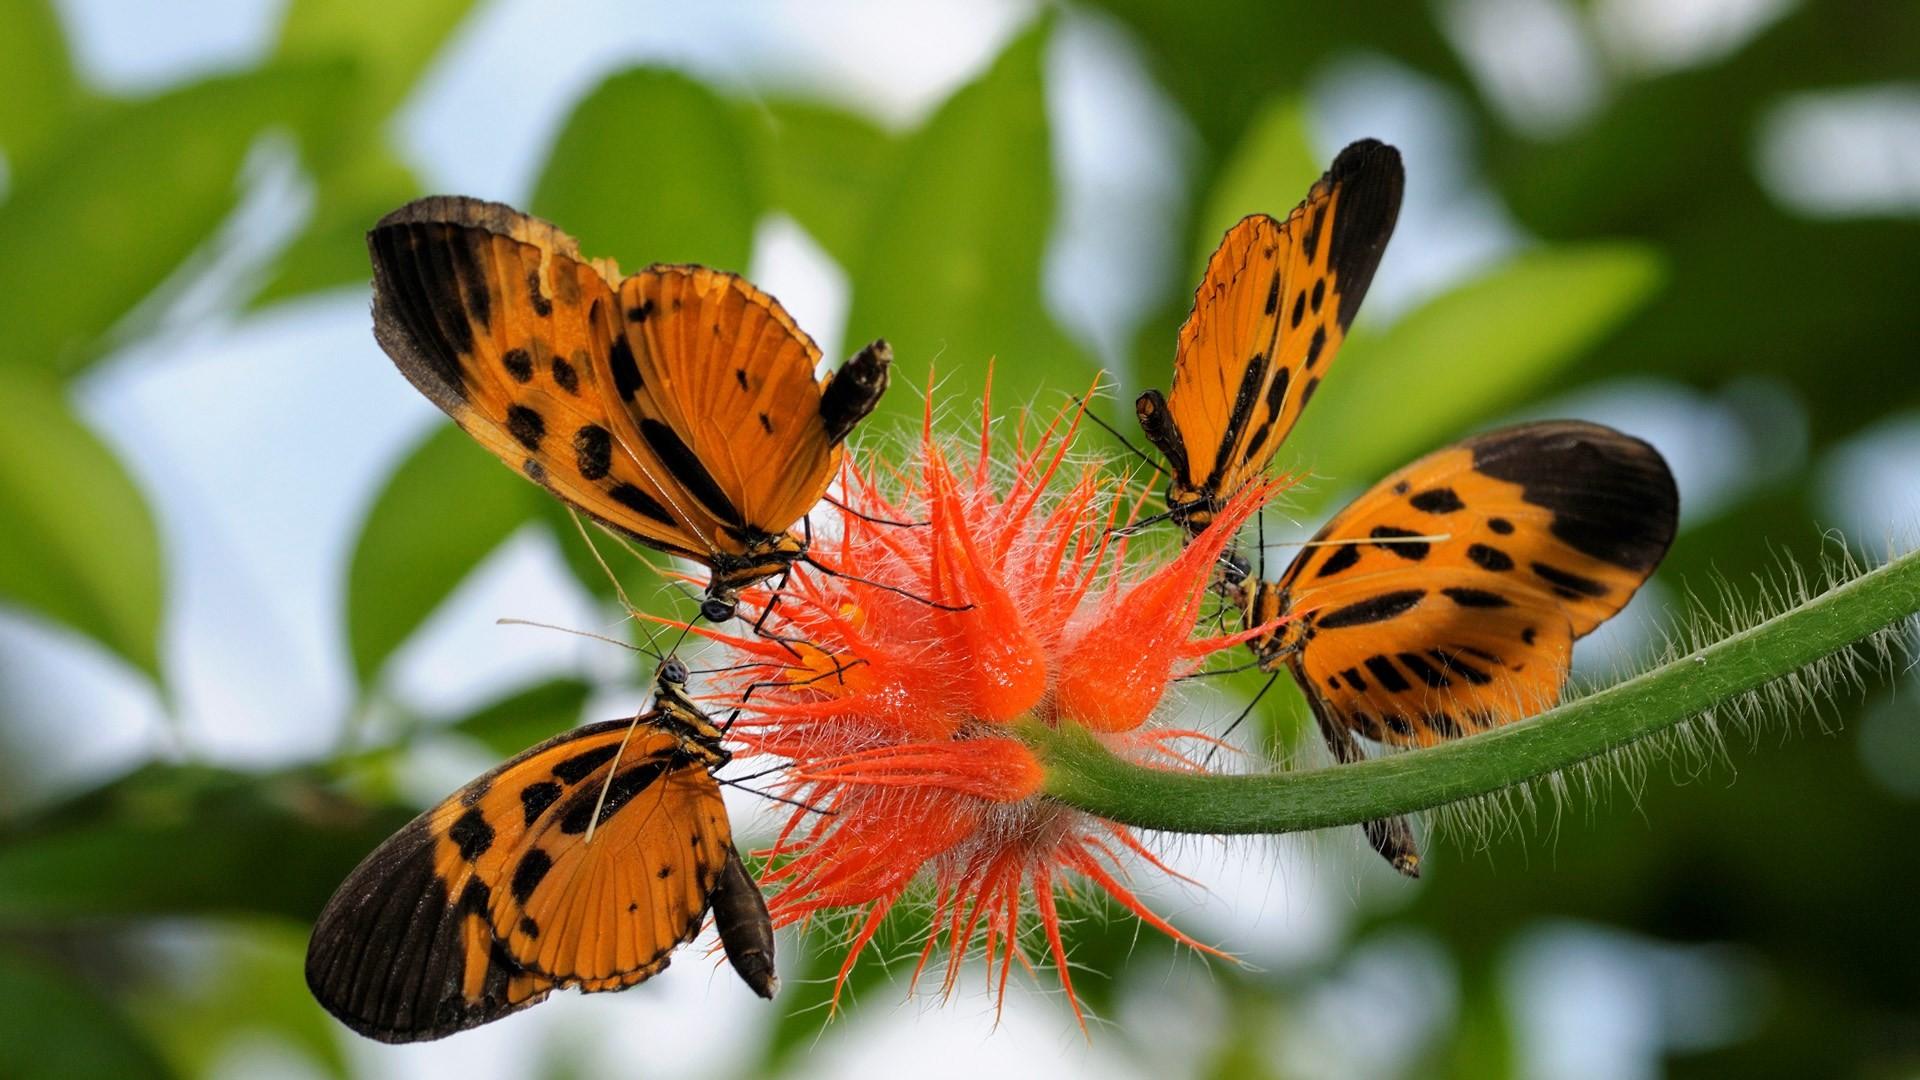 butterfly screensavers backgrounds – butterfly category